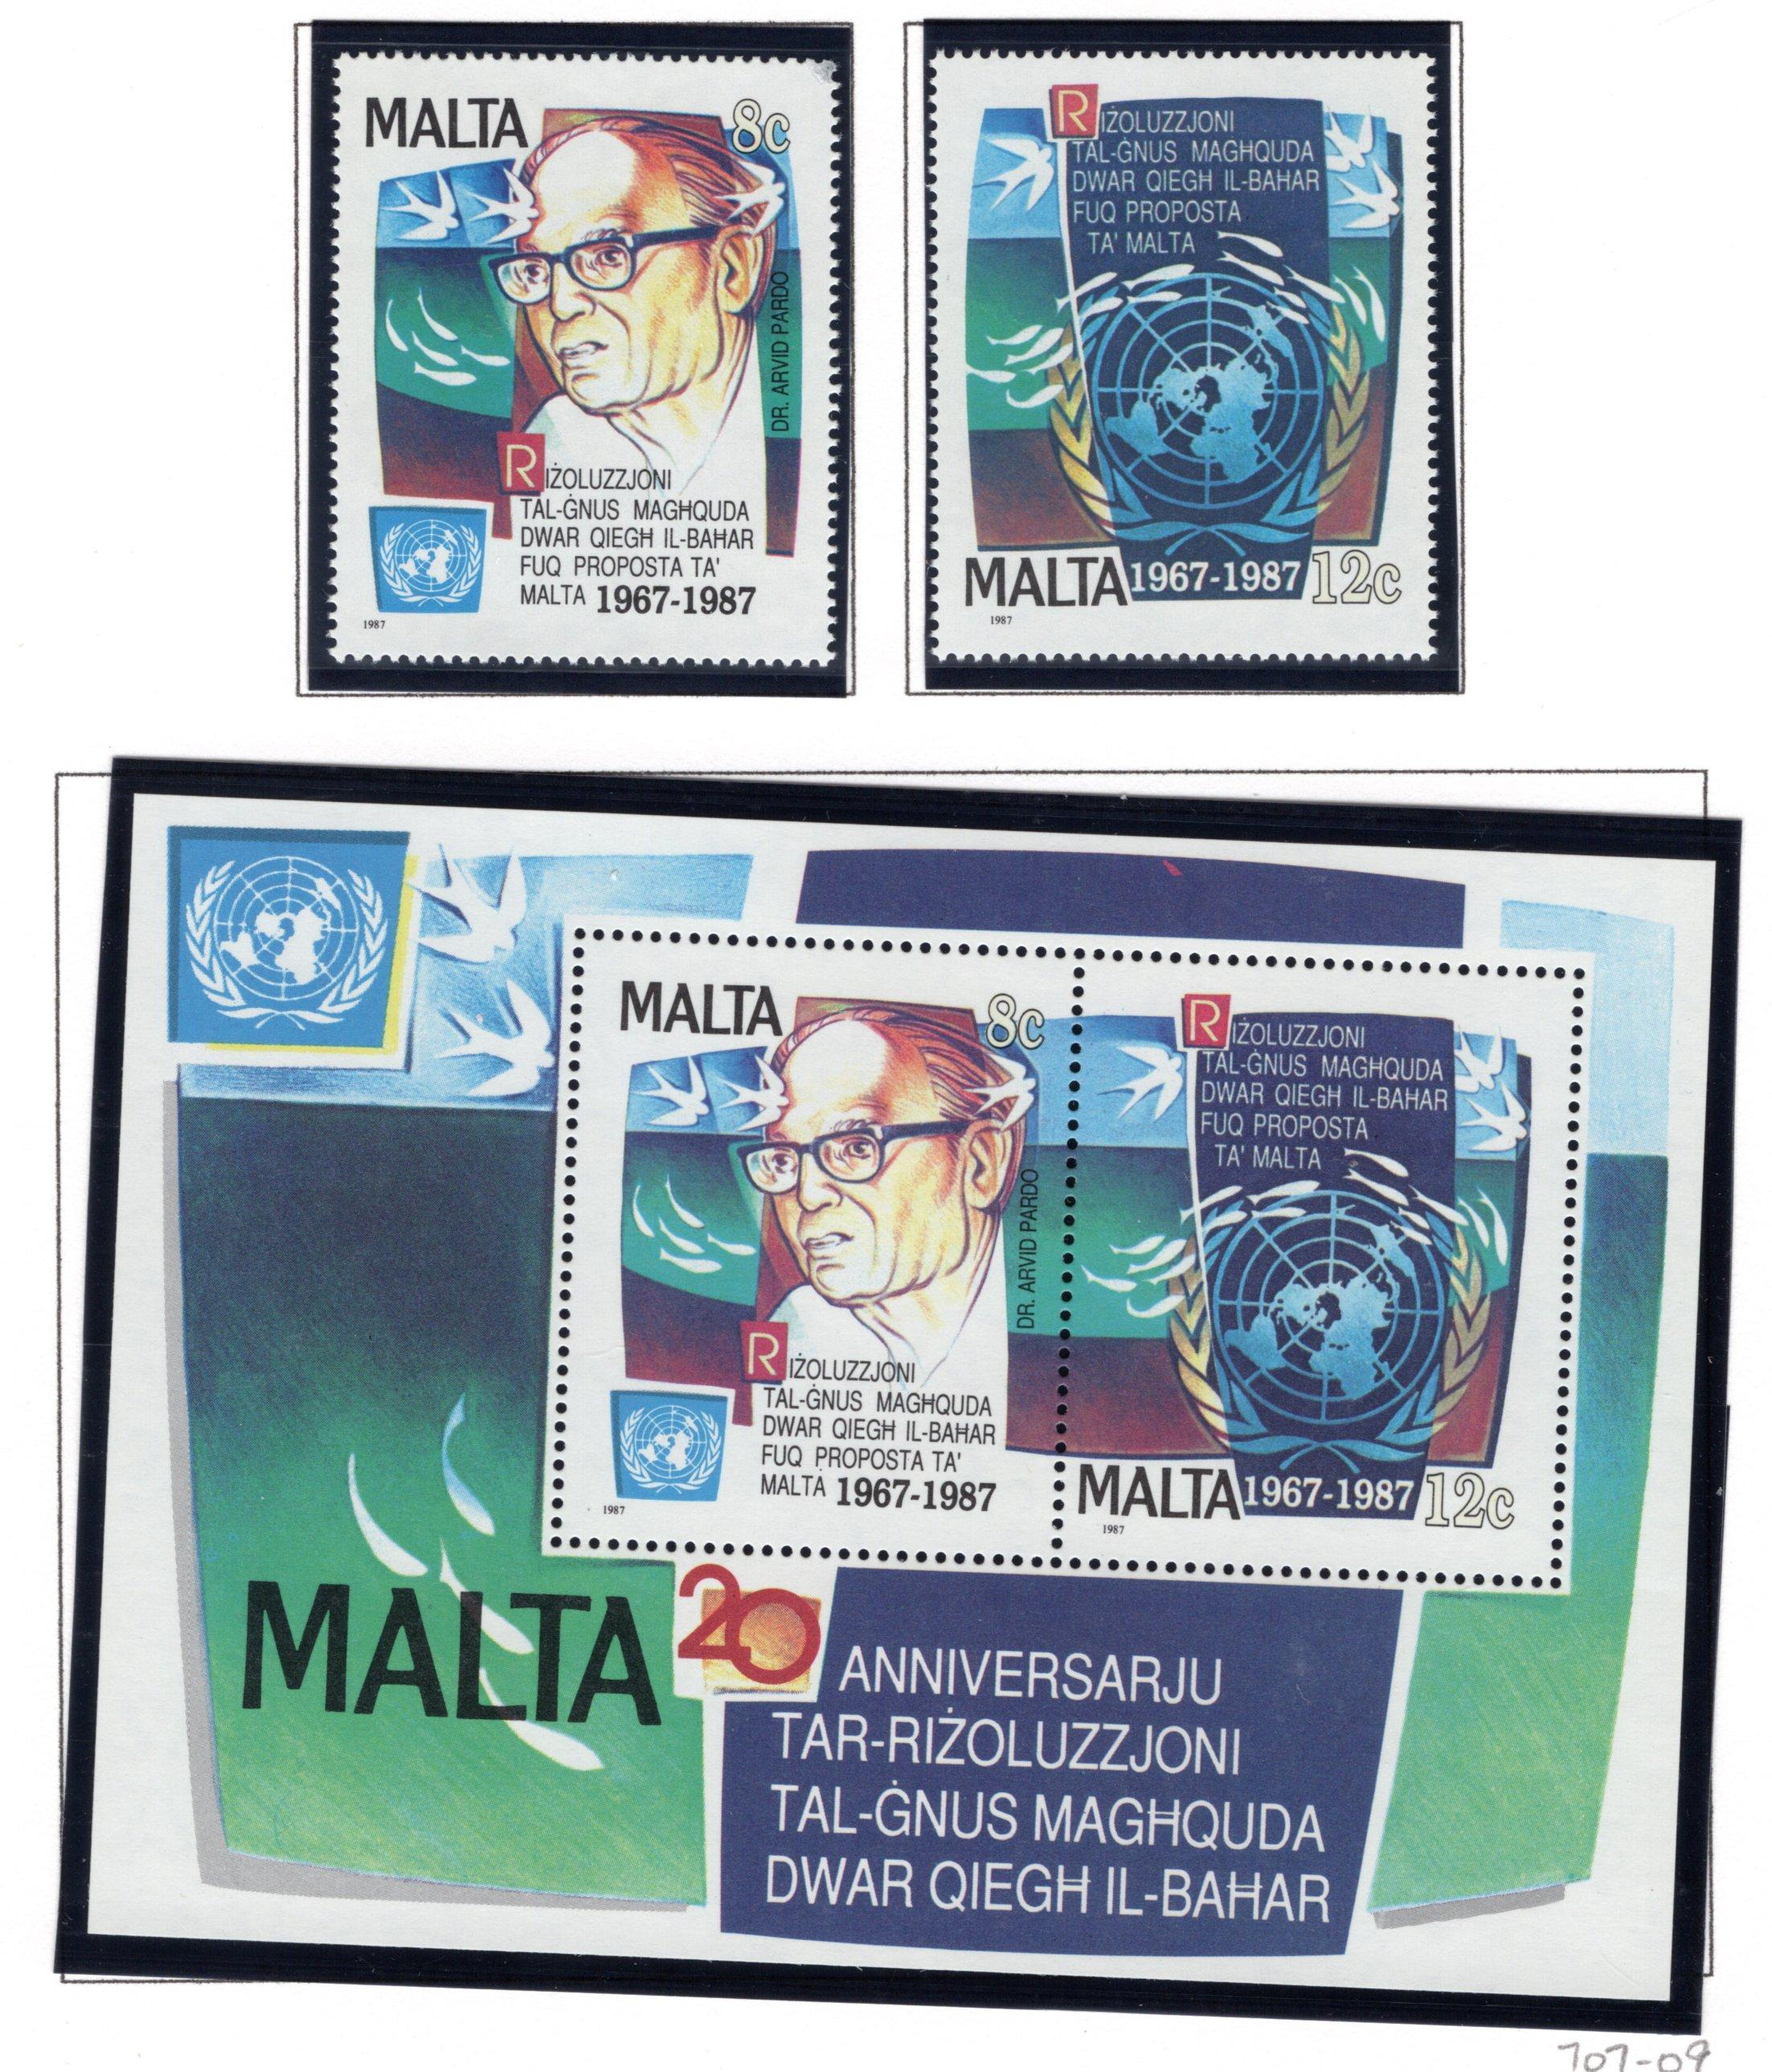 707-709a Malta, United Nations Stamp Set with Souvenir Sheet, 1987, MNHOG